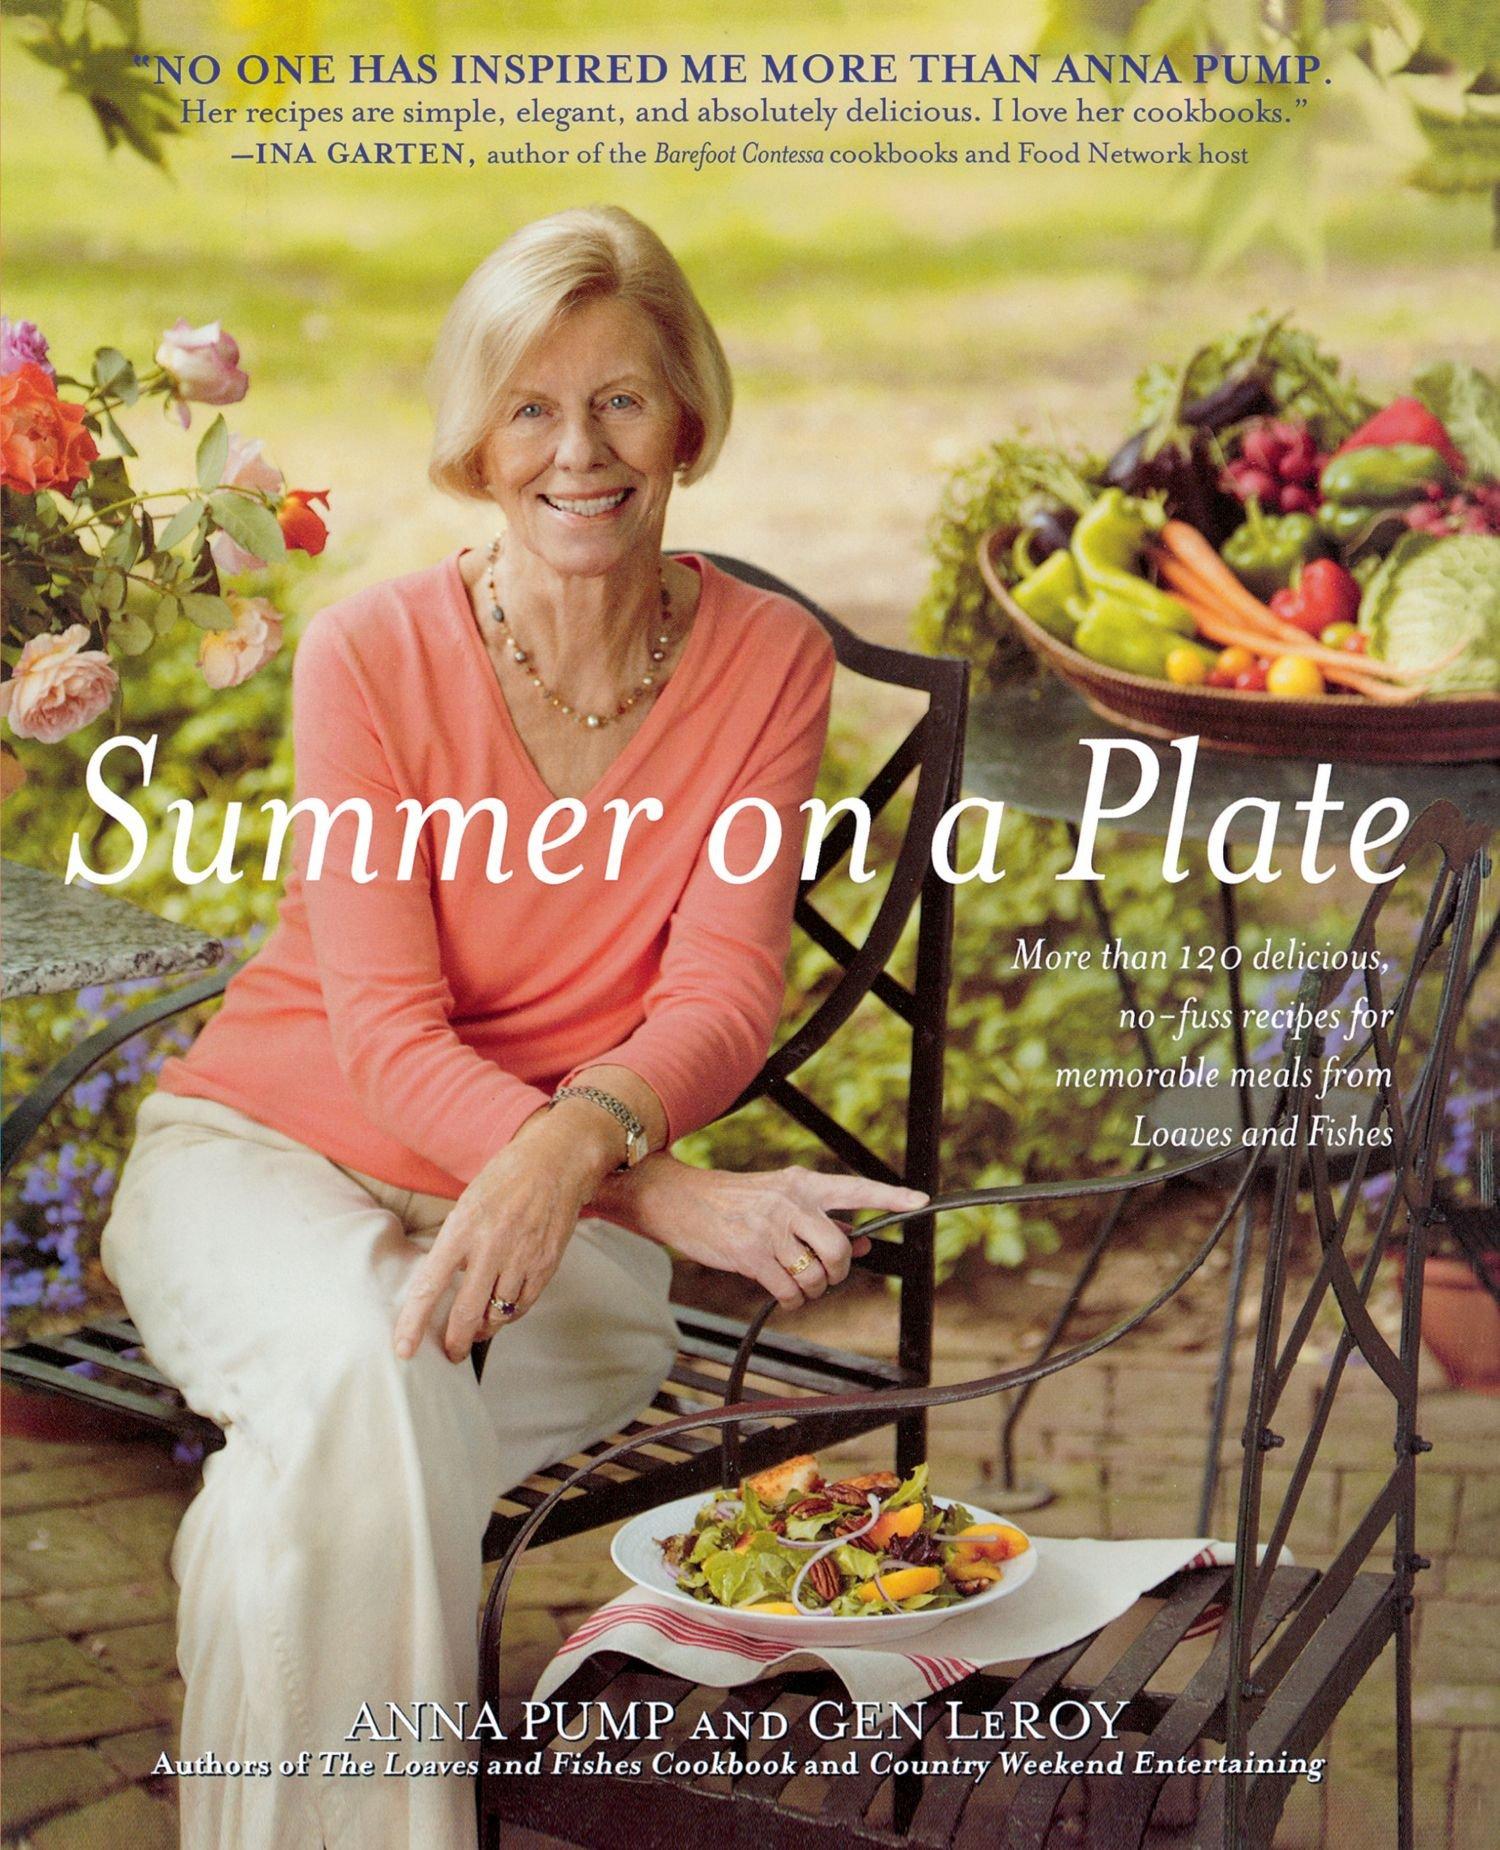 Summer On A Plate: More Than 120 Delicious, Nofuss Recipes For Memor: Anna  Pump, Gen Leroy, Alan Richardson: 9781451626018: Amazon: Books